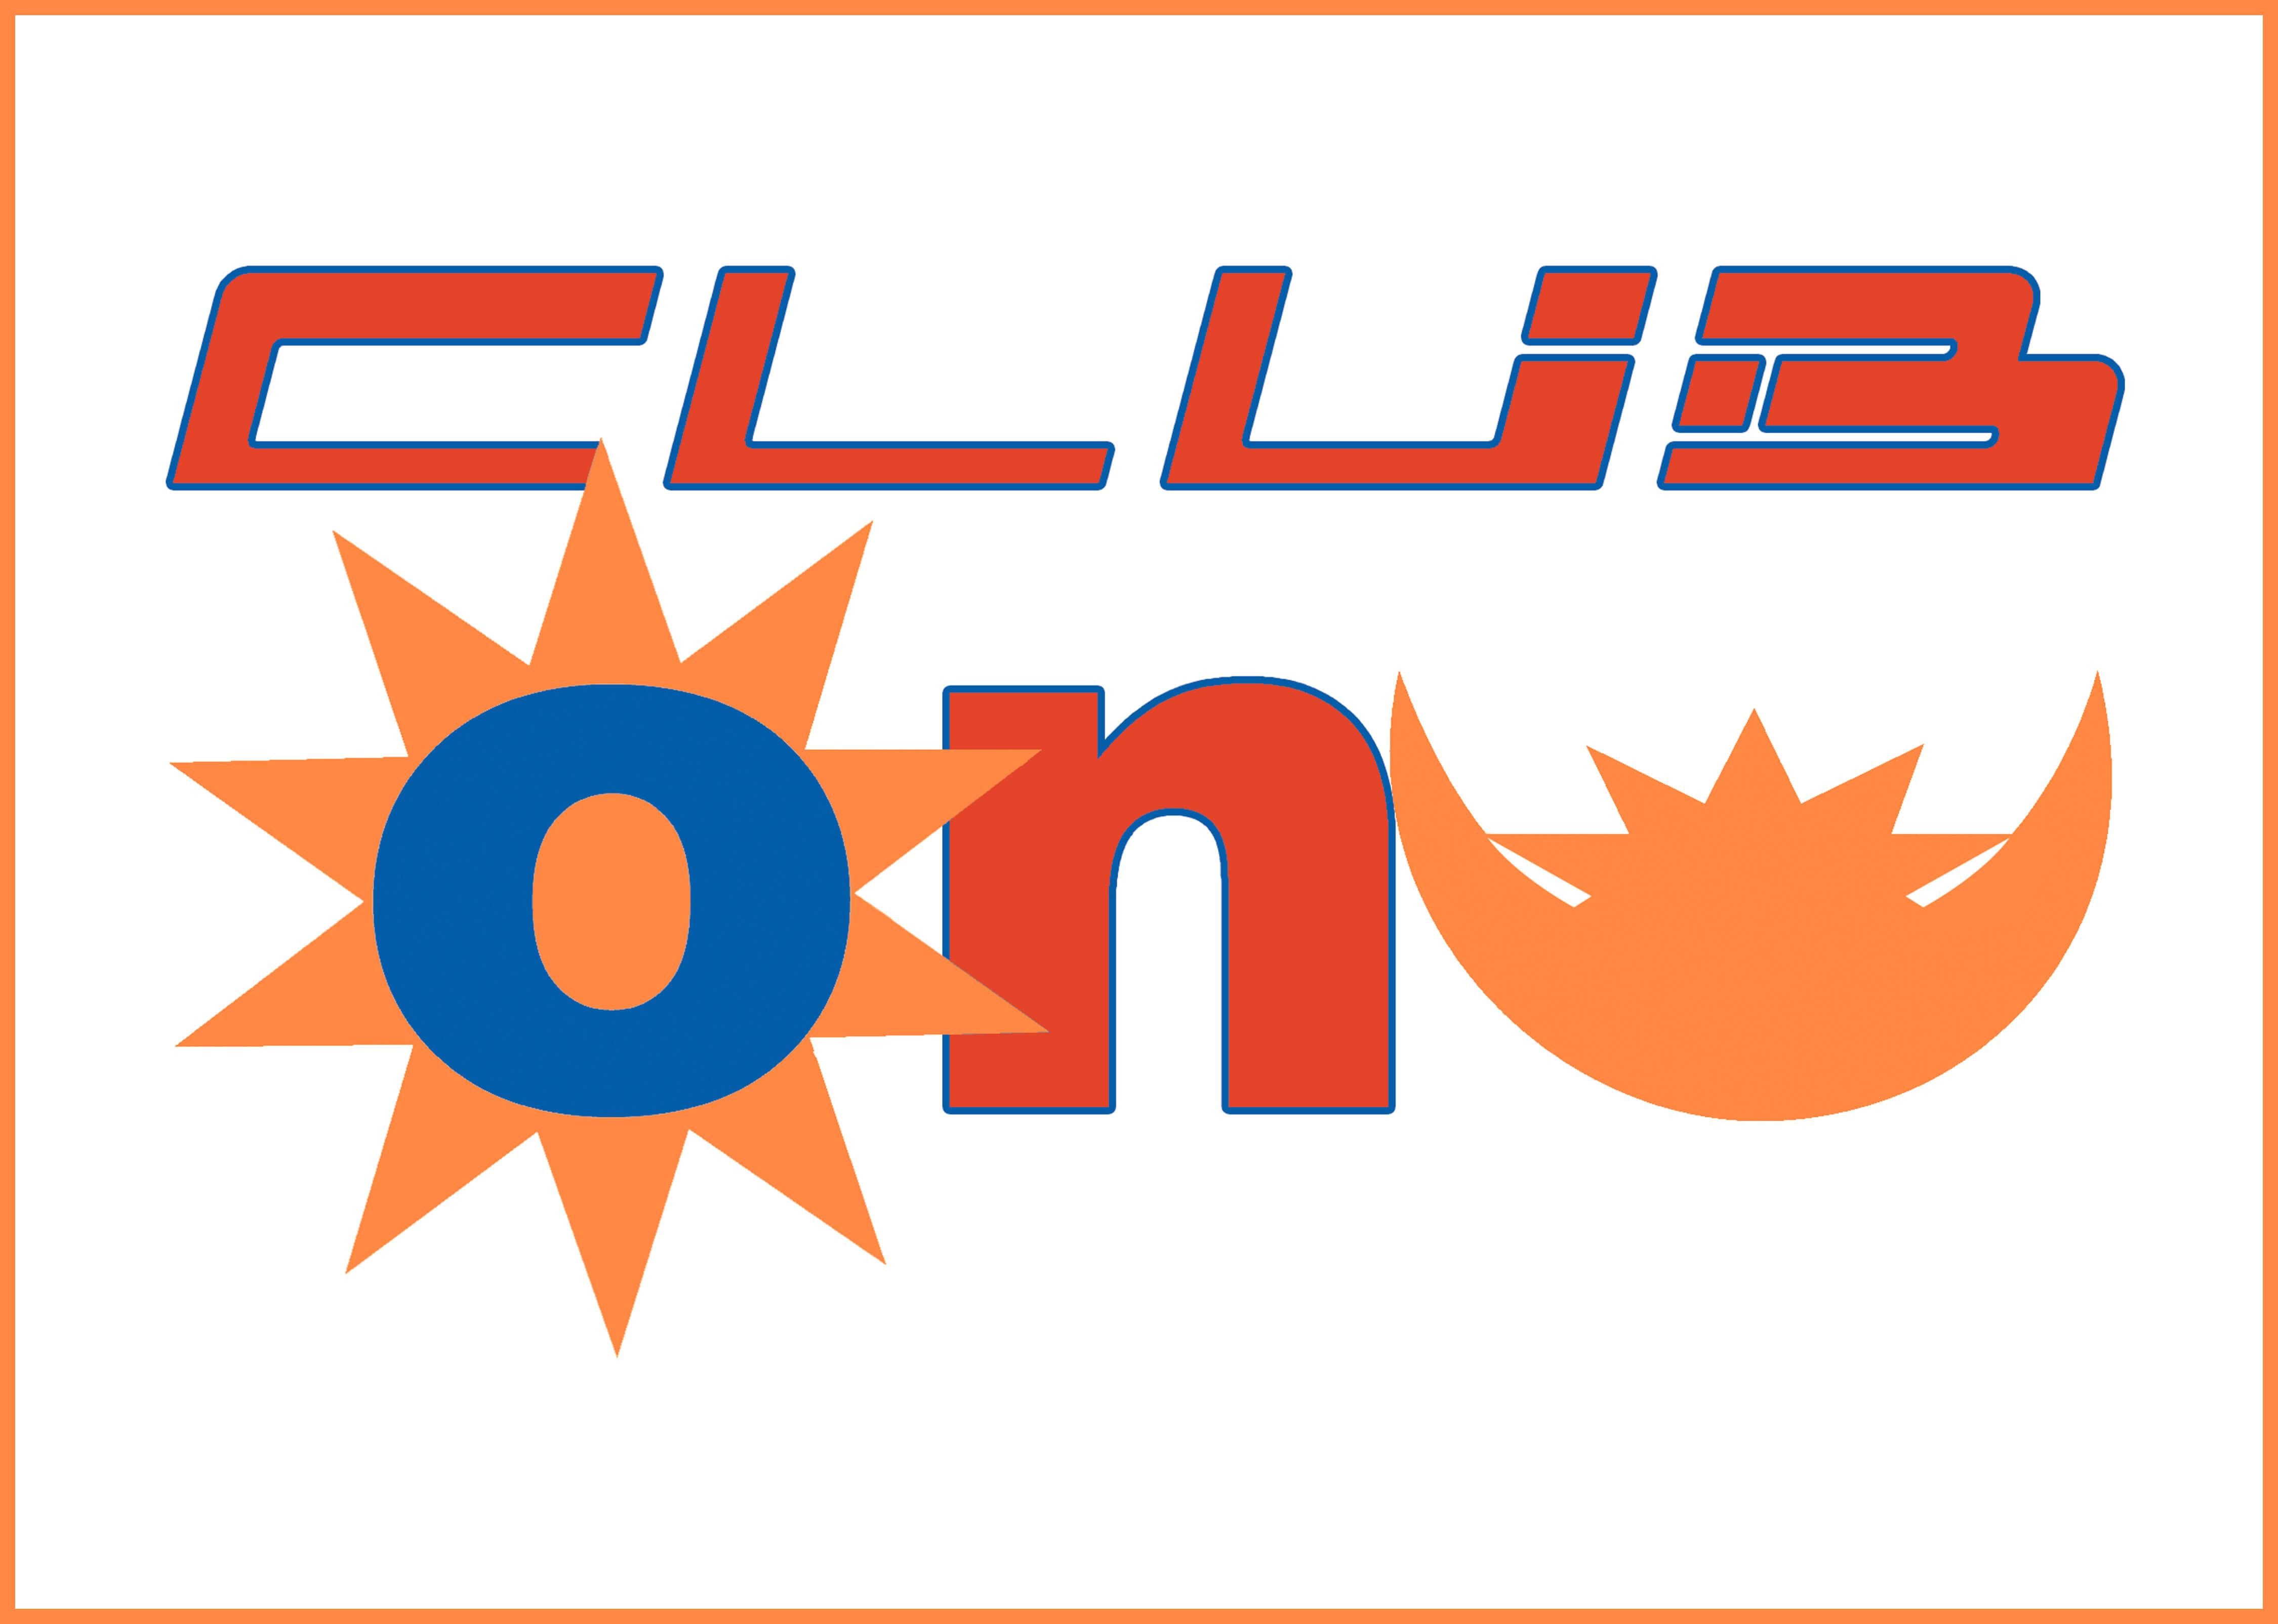 ClubON